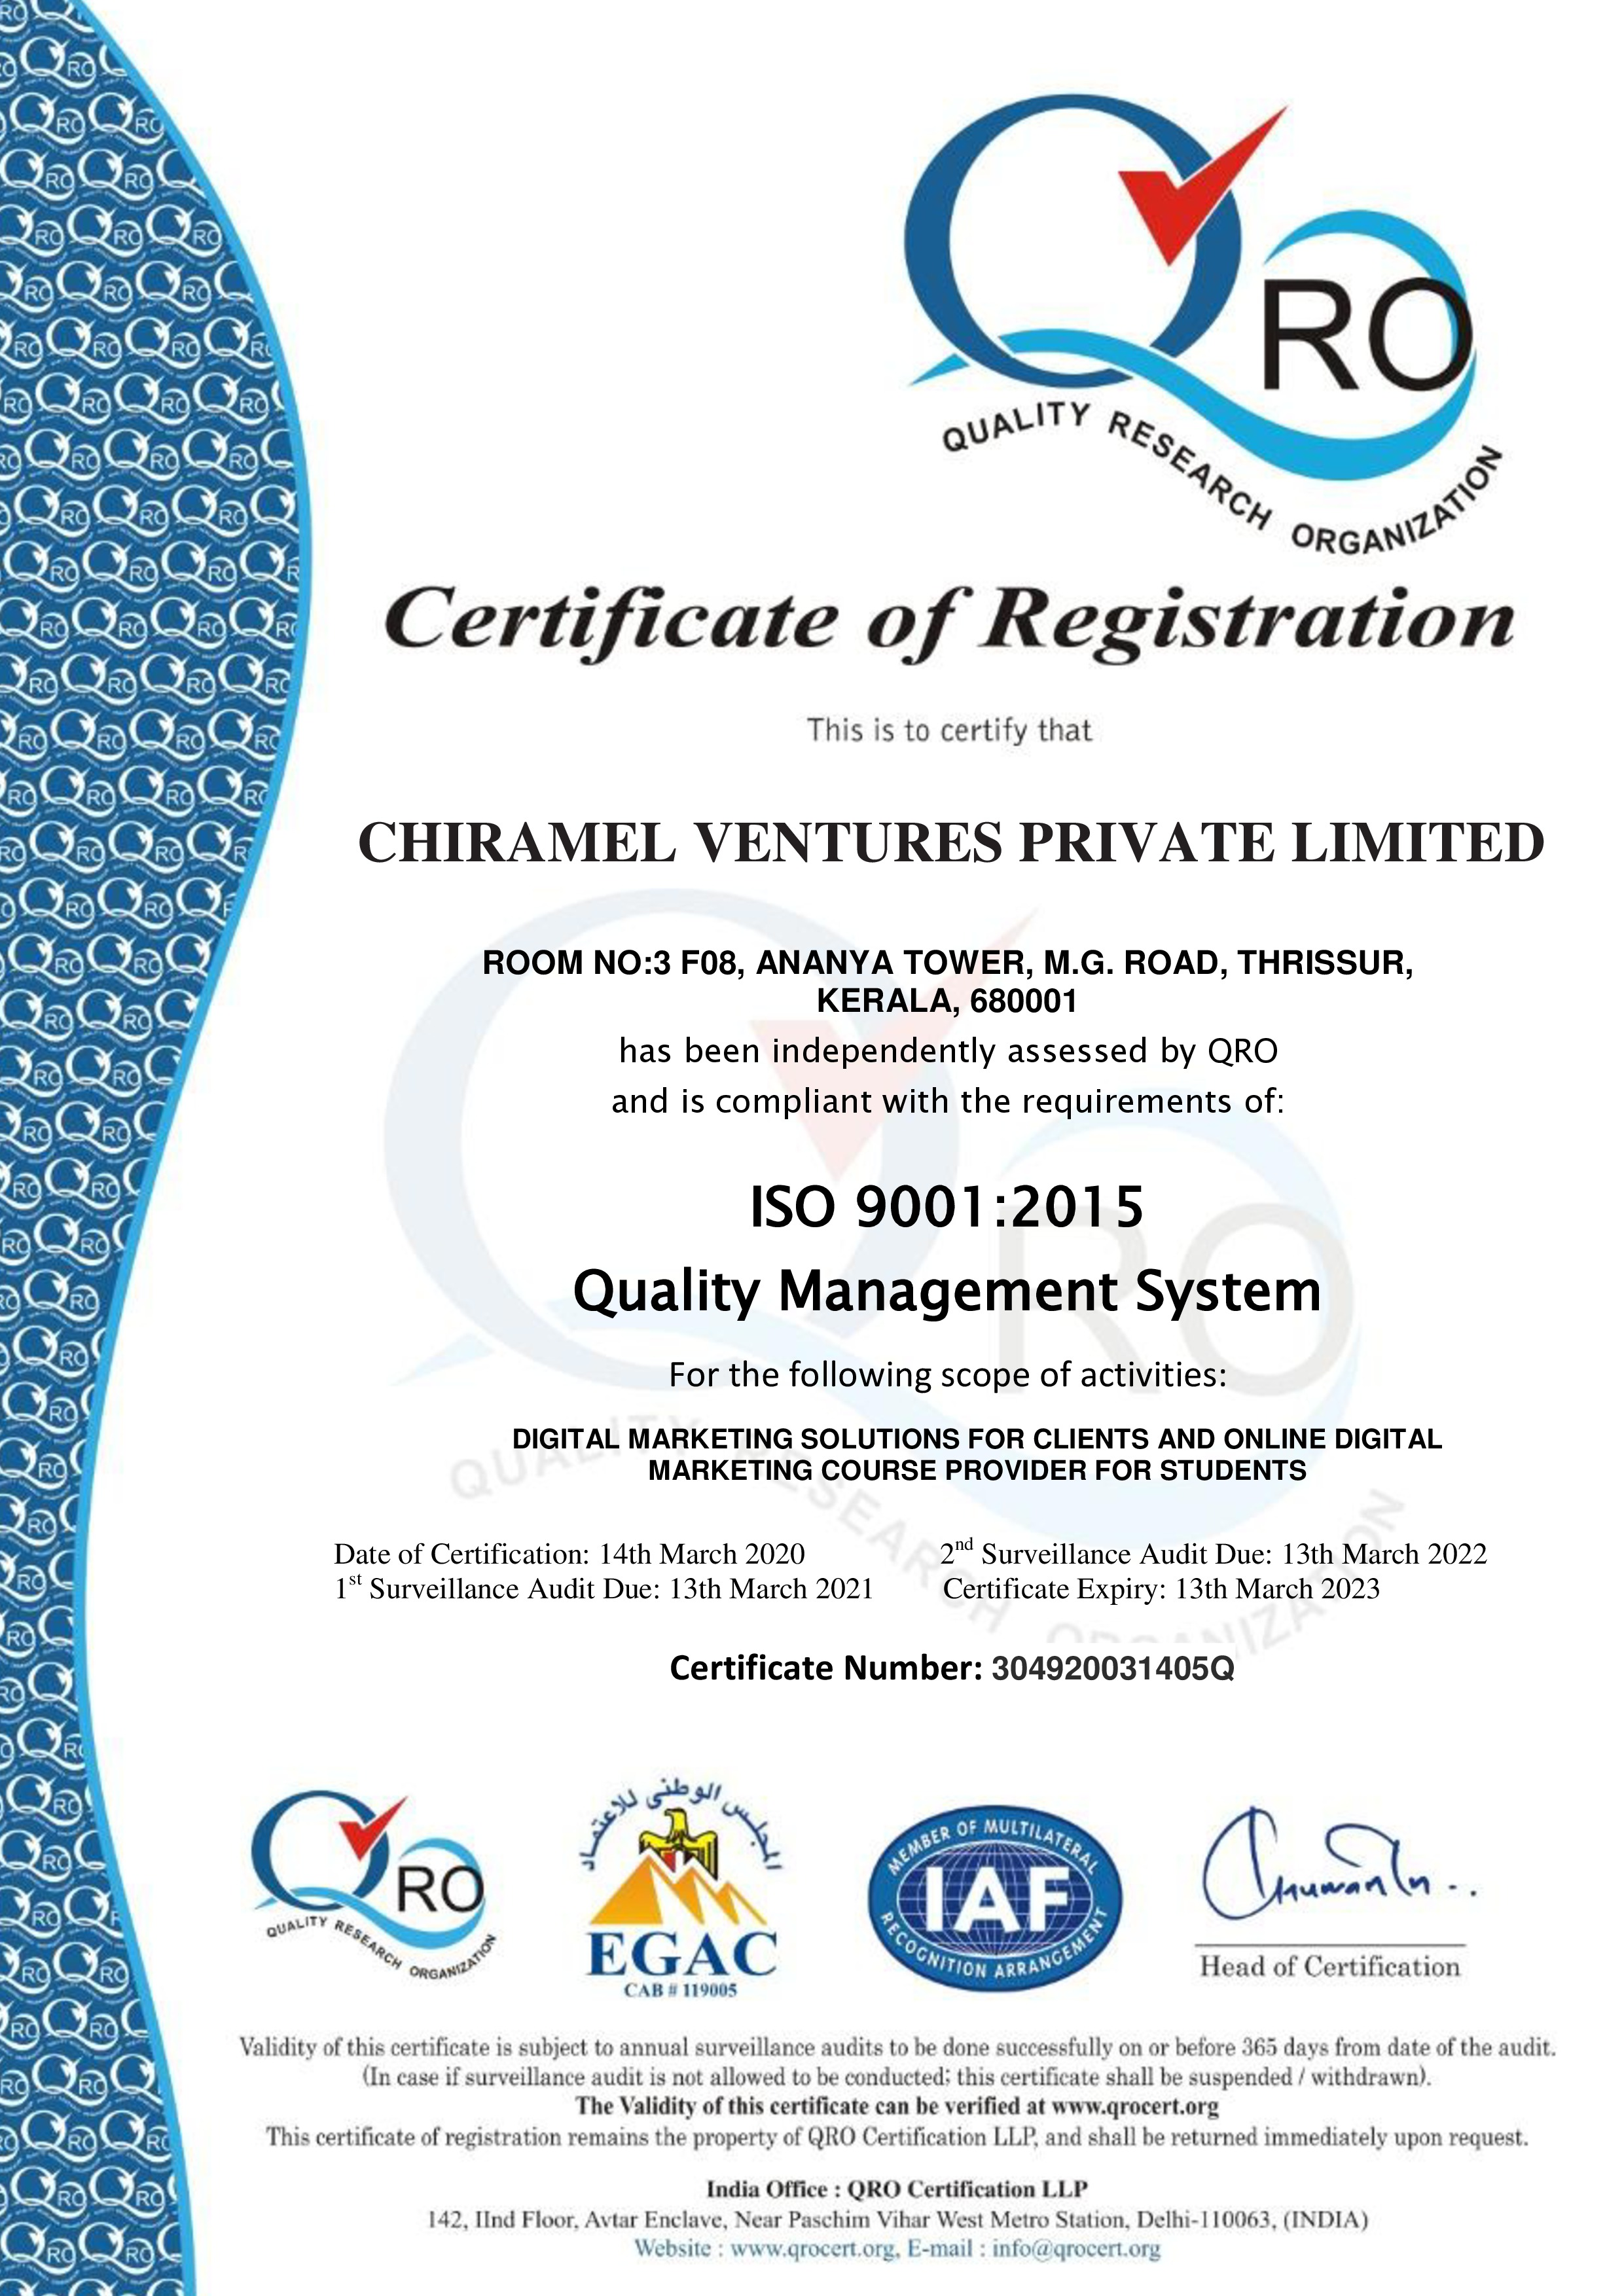 Chiramel Ventures